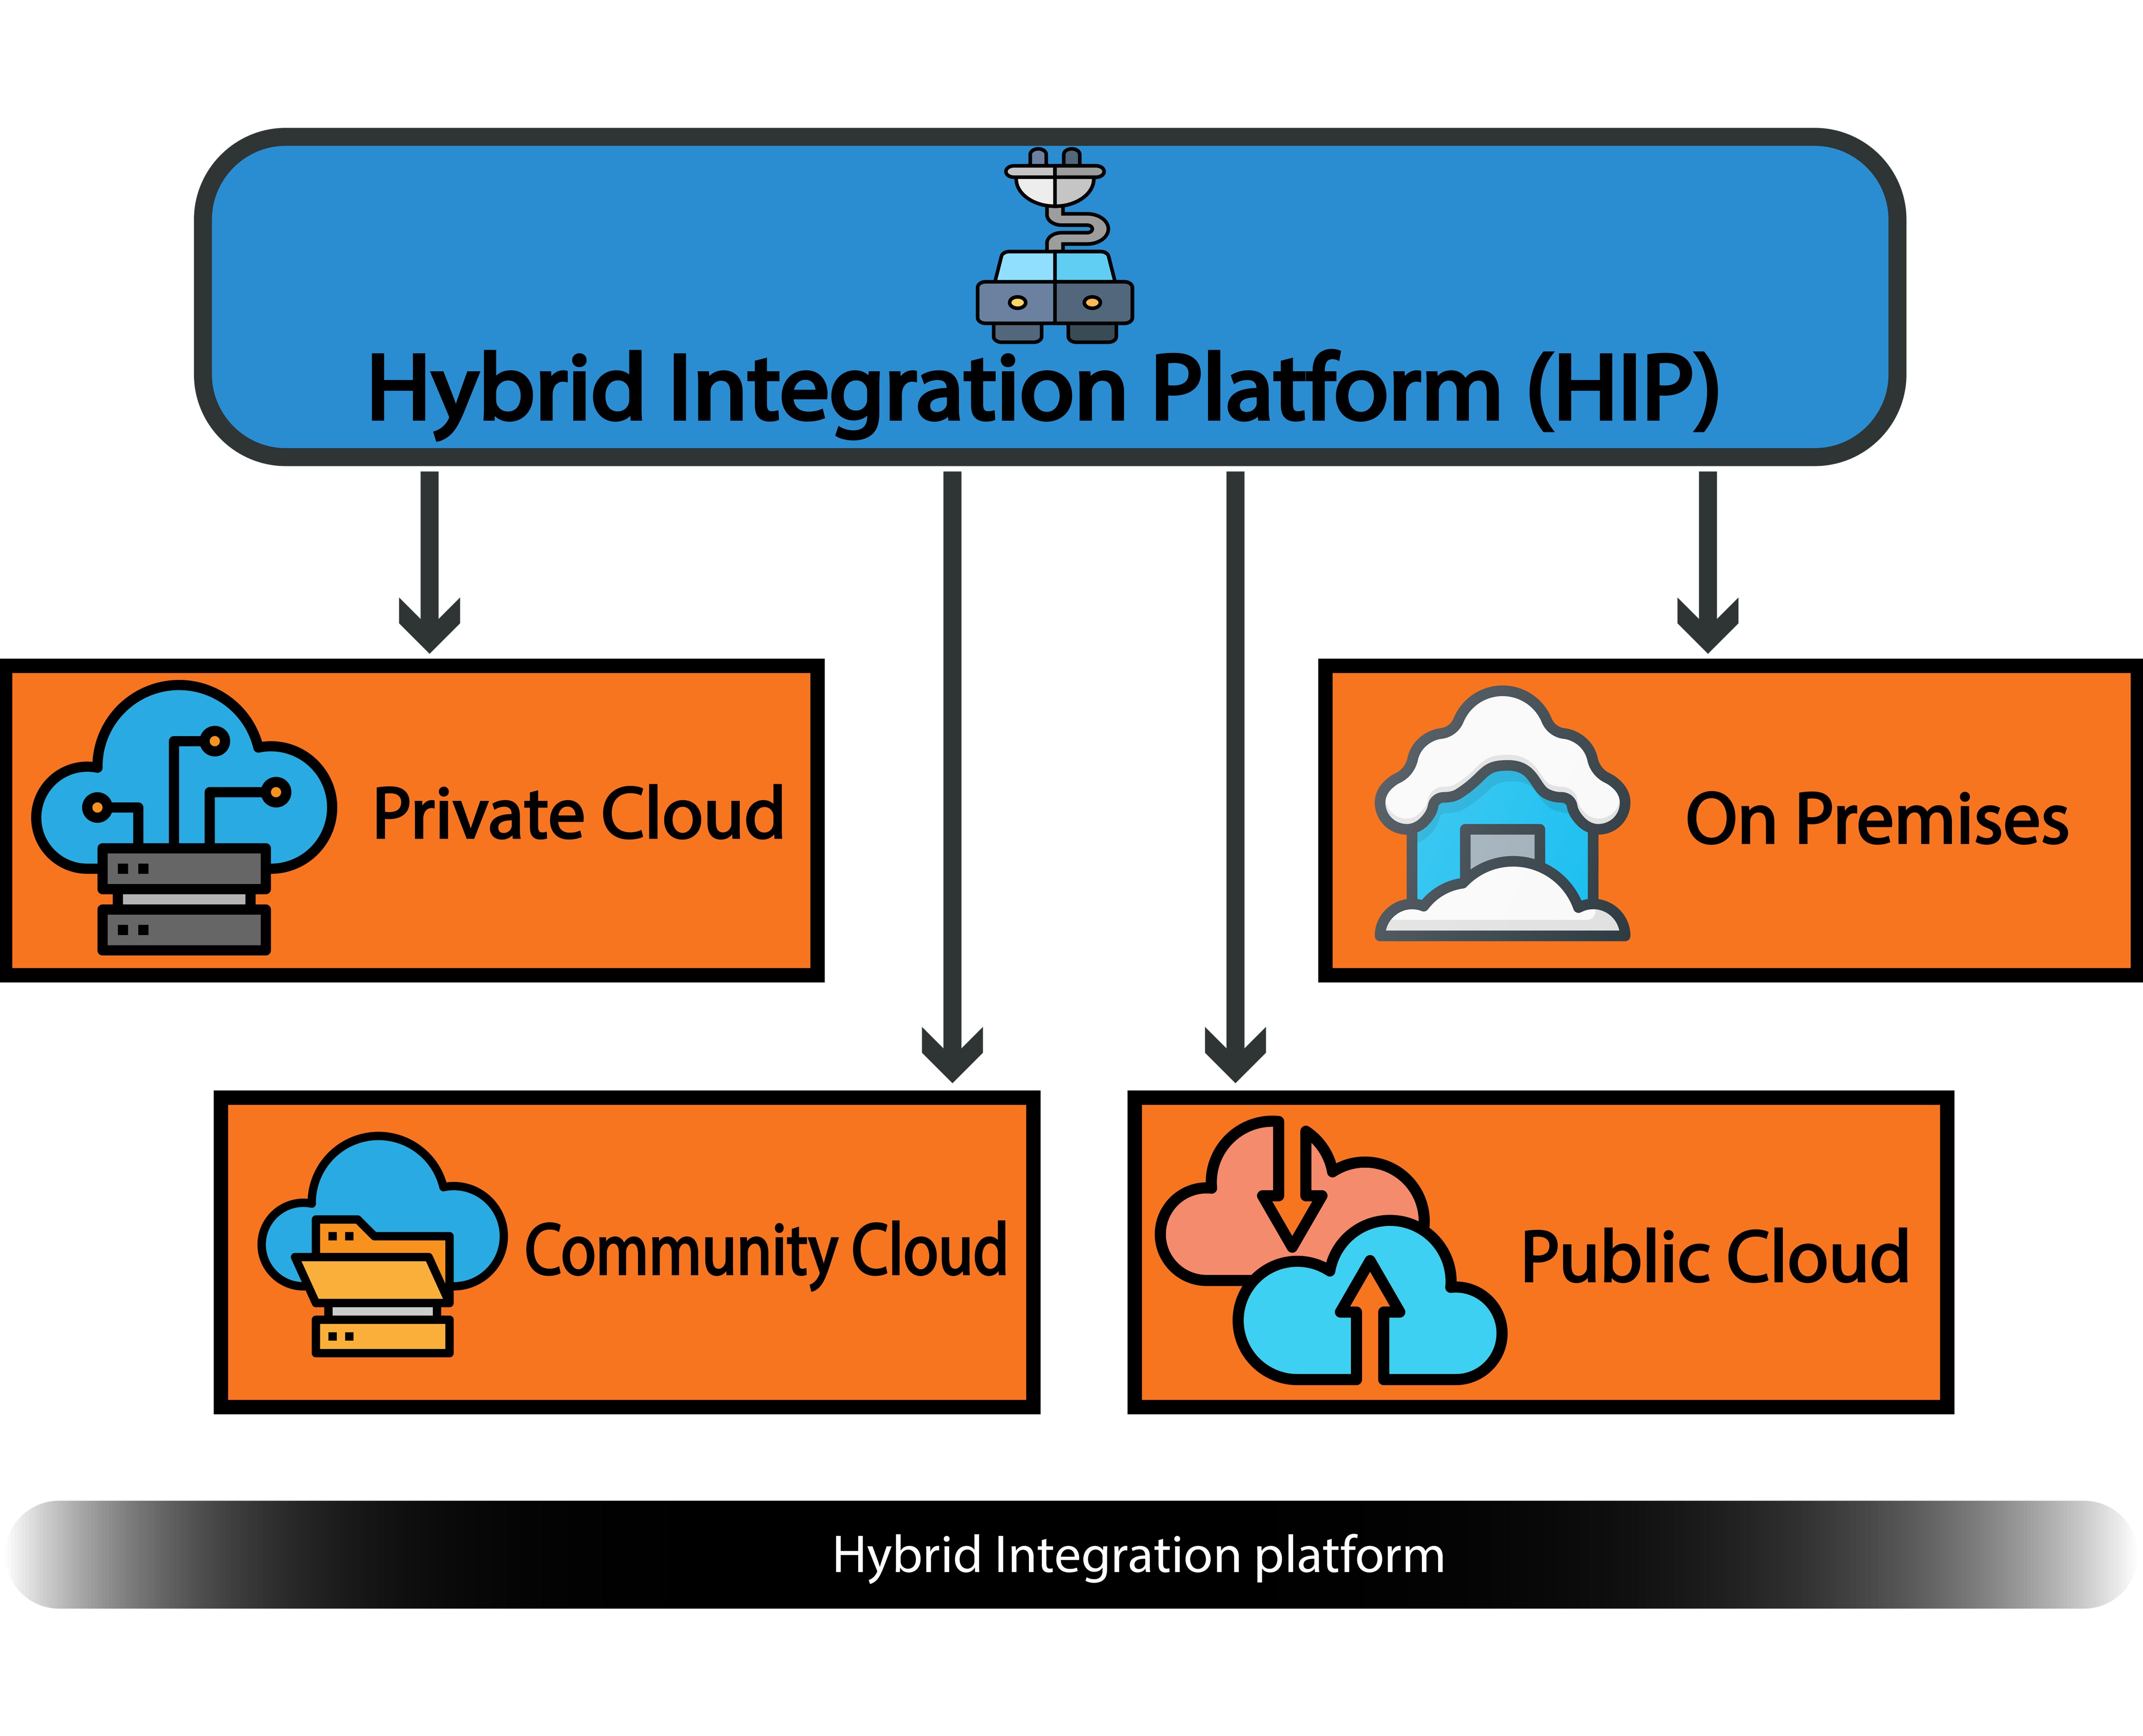 Figure 2, Hybrid Integration Platform